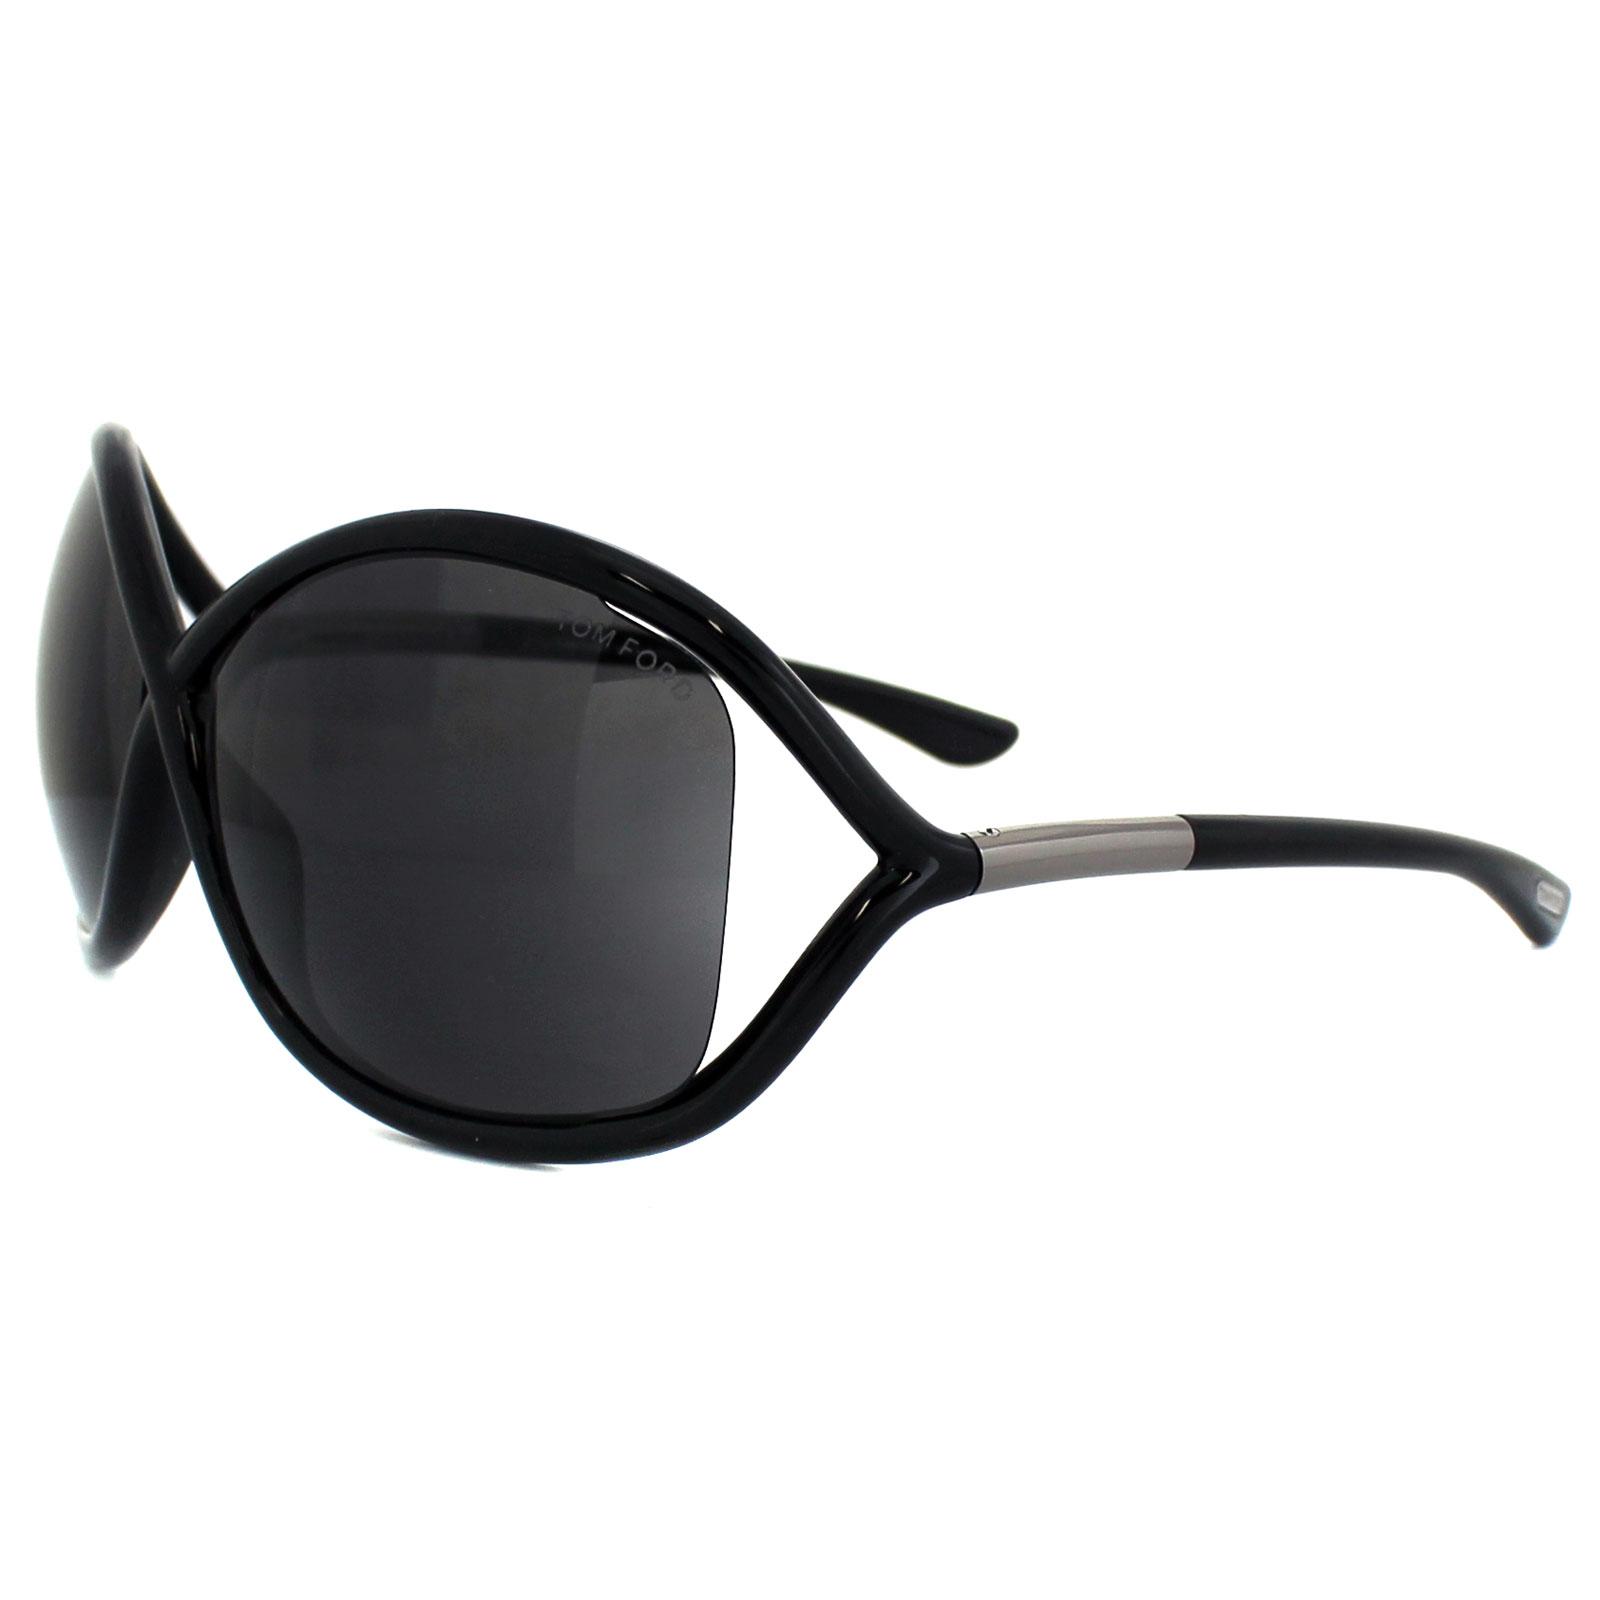 530927a52cb Designer Sunglasses Ebay Uk